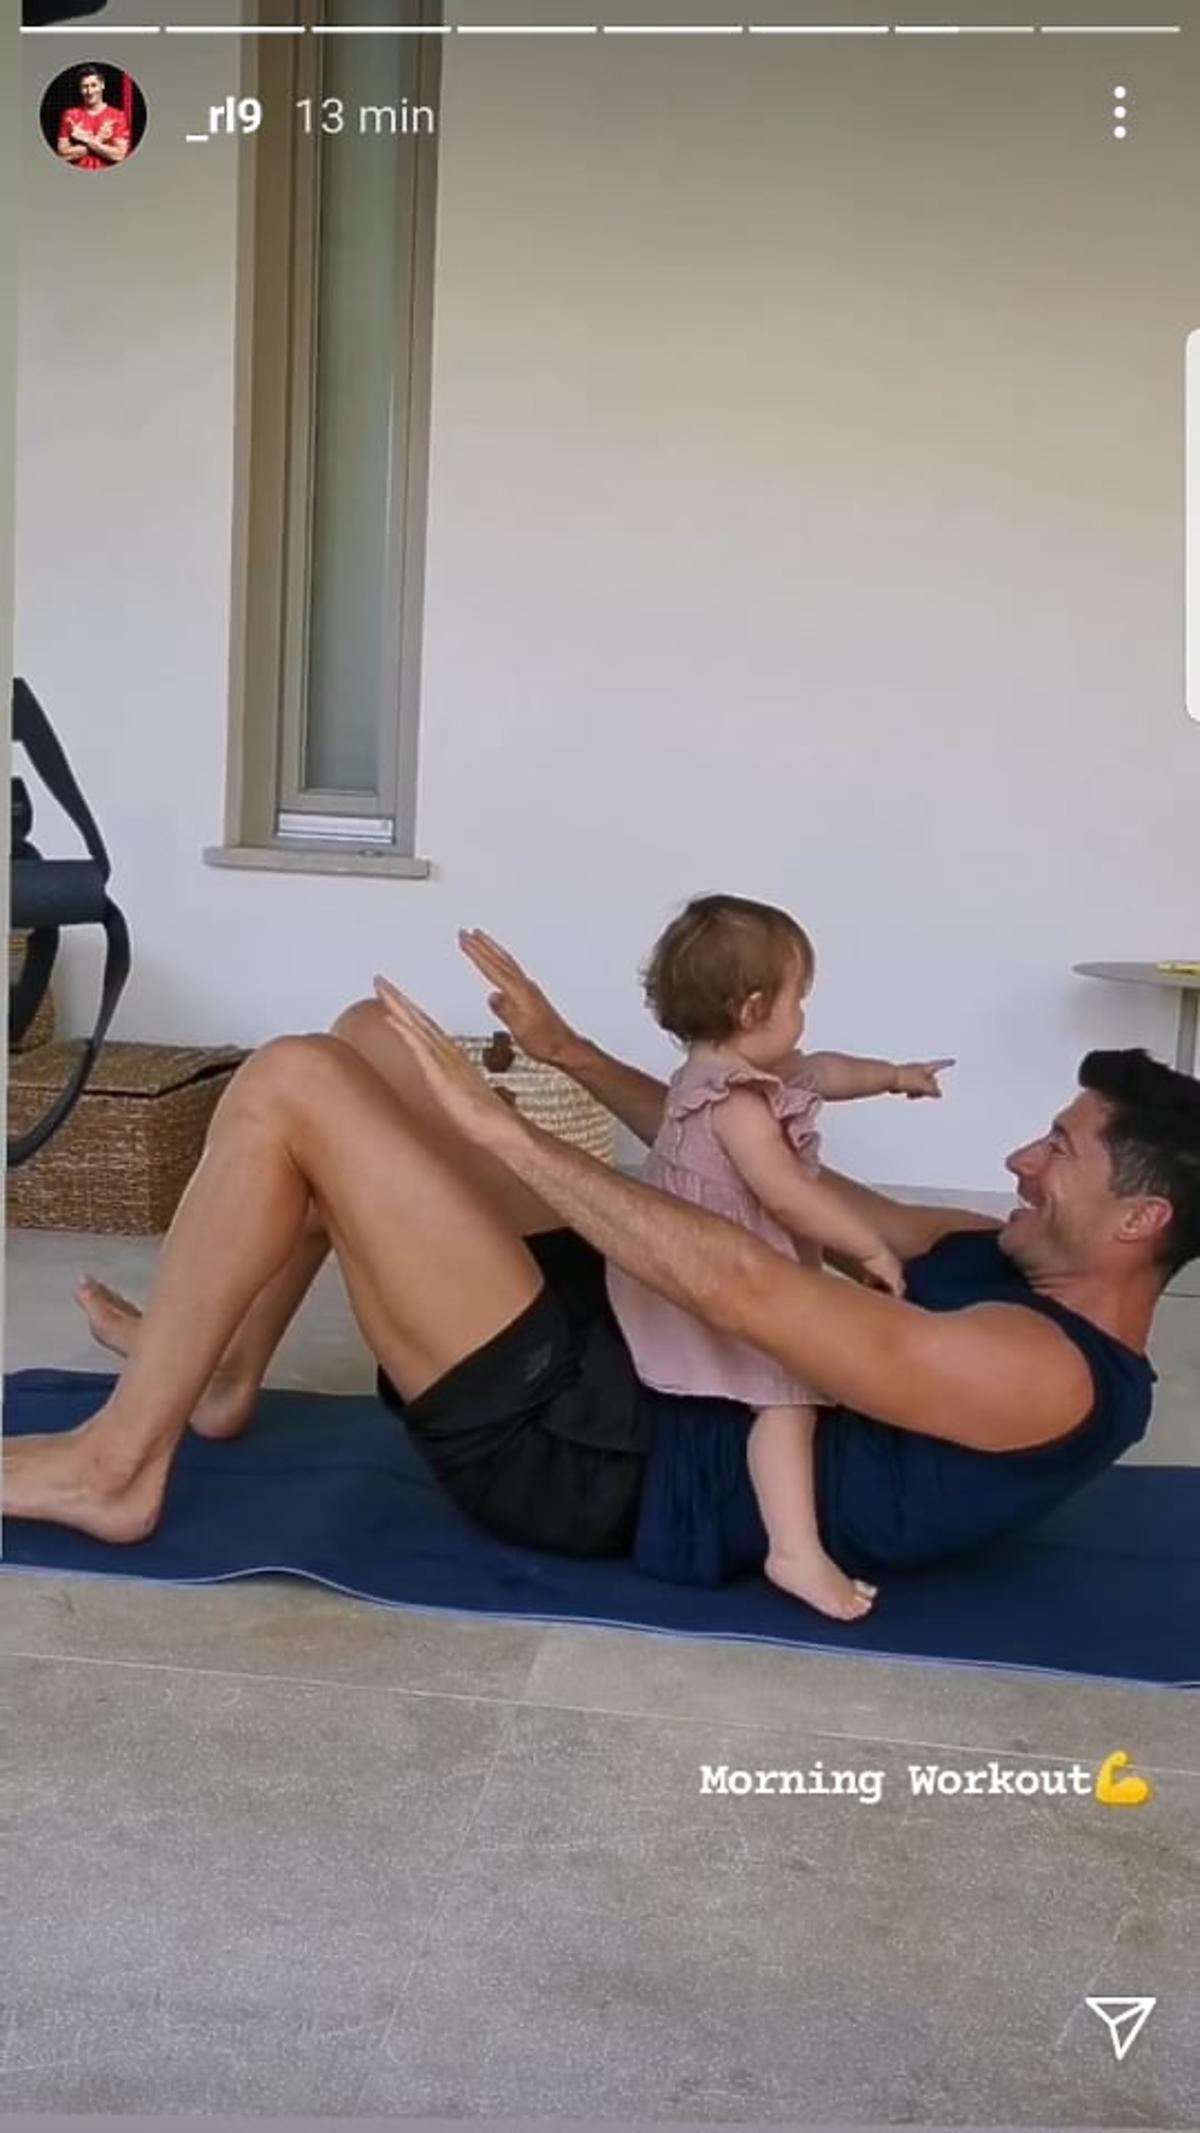 Robert Lewandowski entrena con su hija